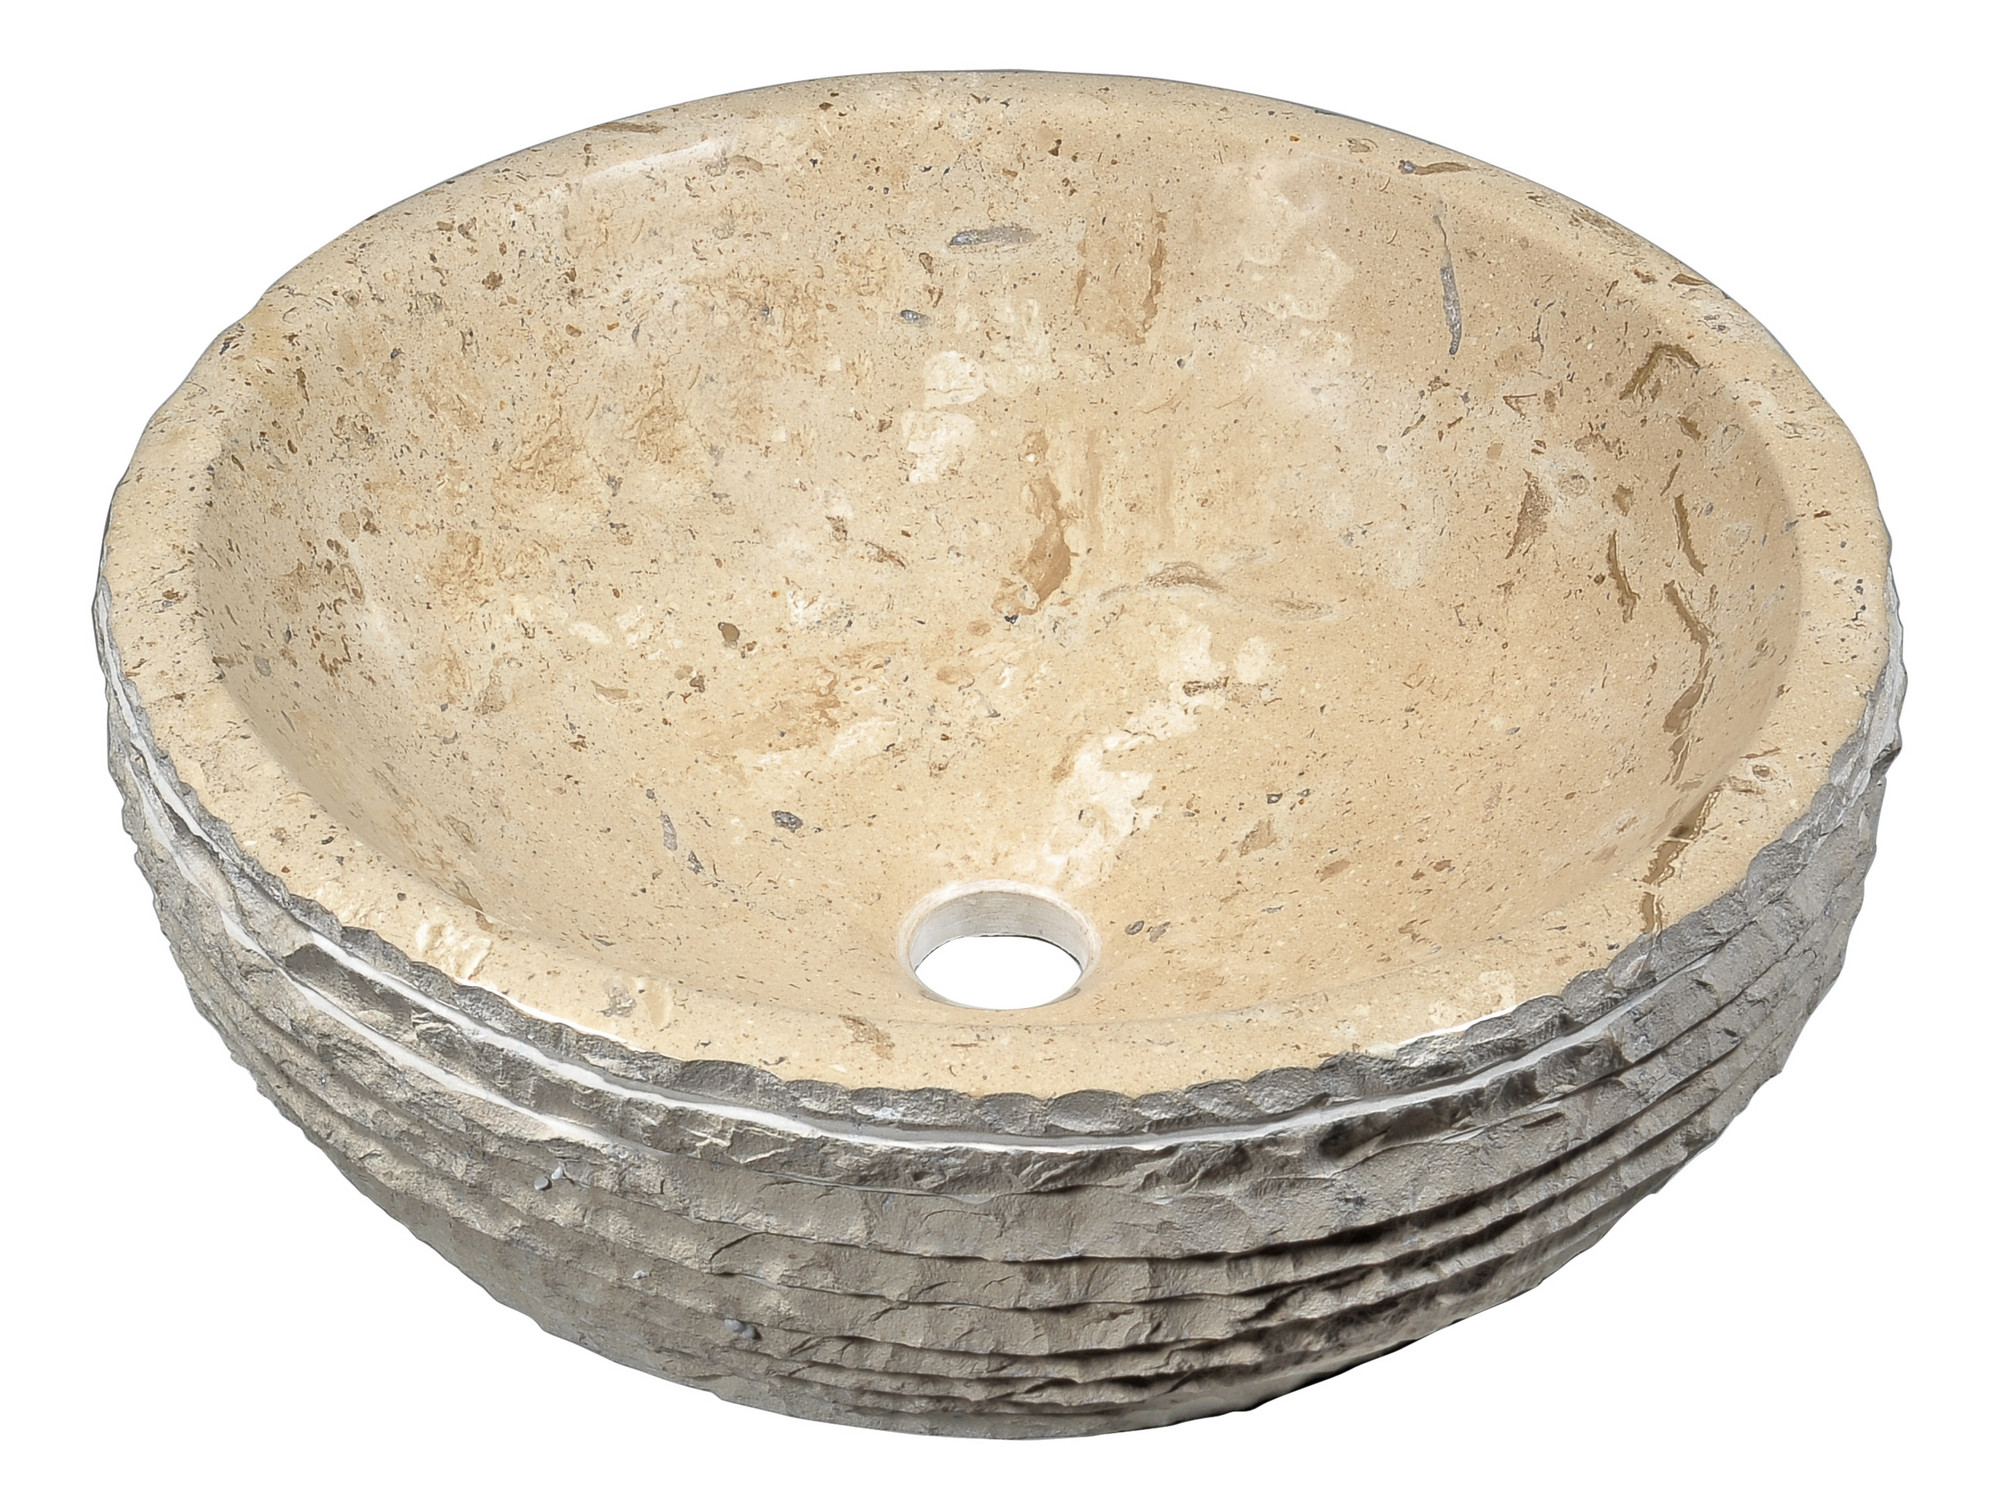 ANZZI LS-AZ147 Desert Basin Modern Vessel Sink In Classic Cream Marble